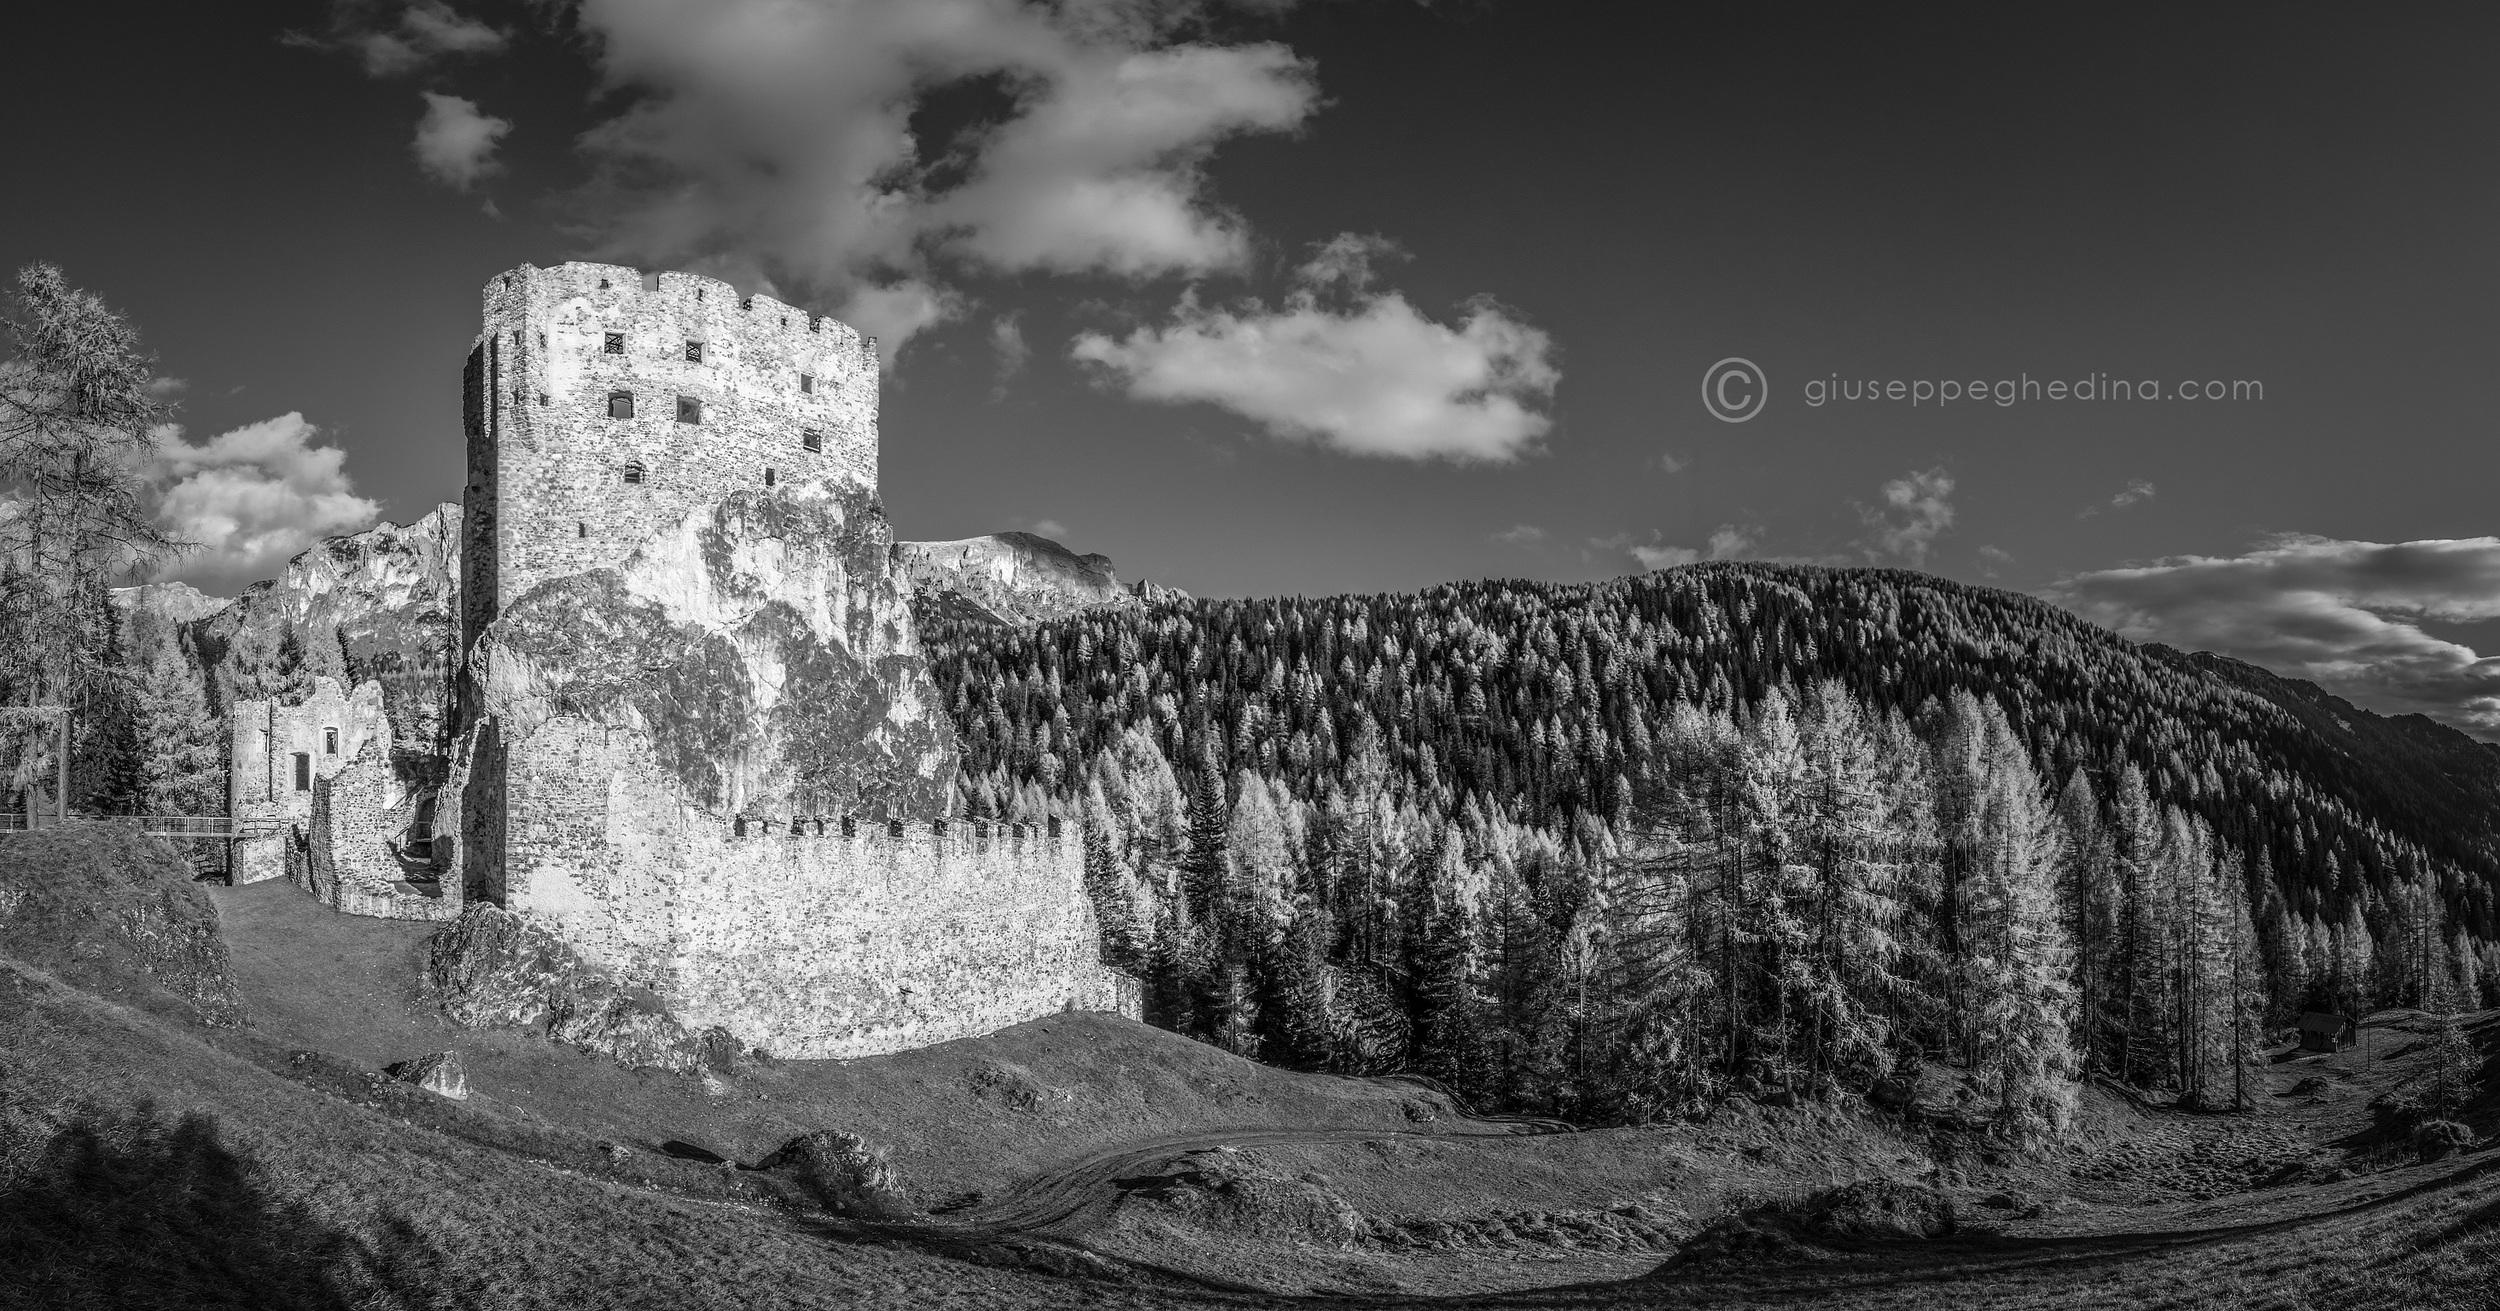 20141103_300-Panorama_photo_giuseppe_ghedina_castello_andraz.jpg